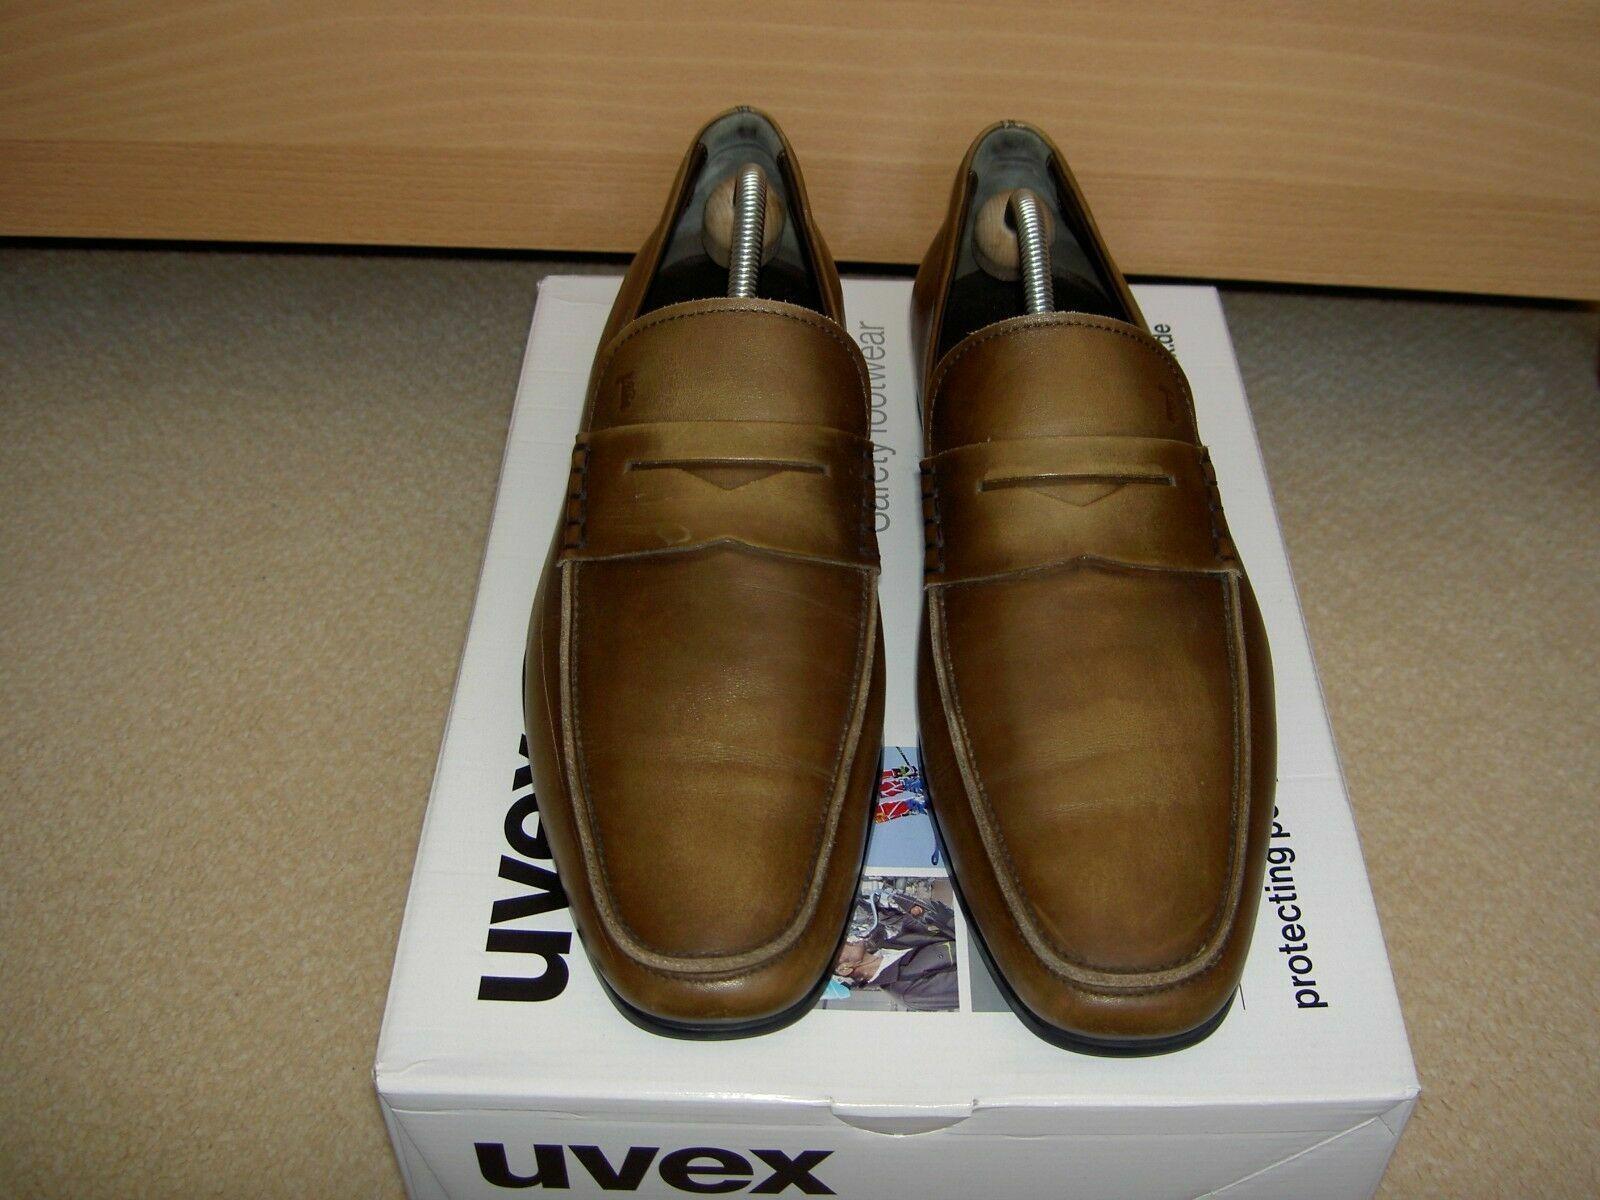 Tod's Schuhe, Herren Mokassins,  Gr. 44 SEHR GUT